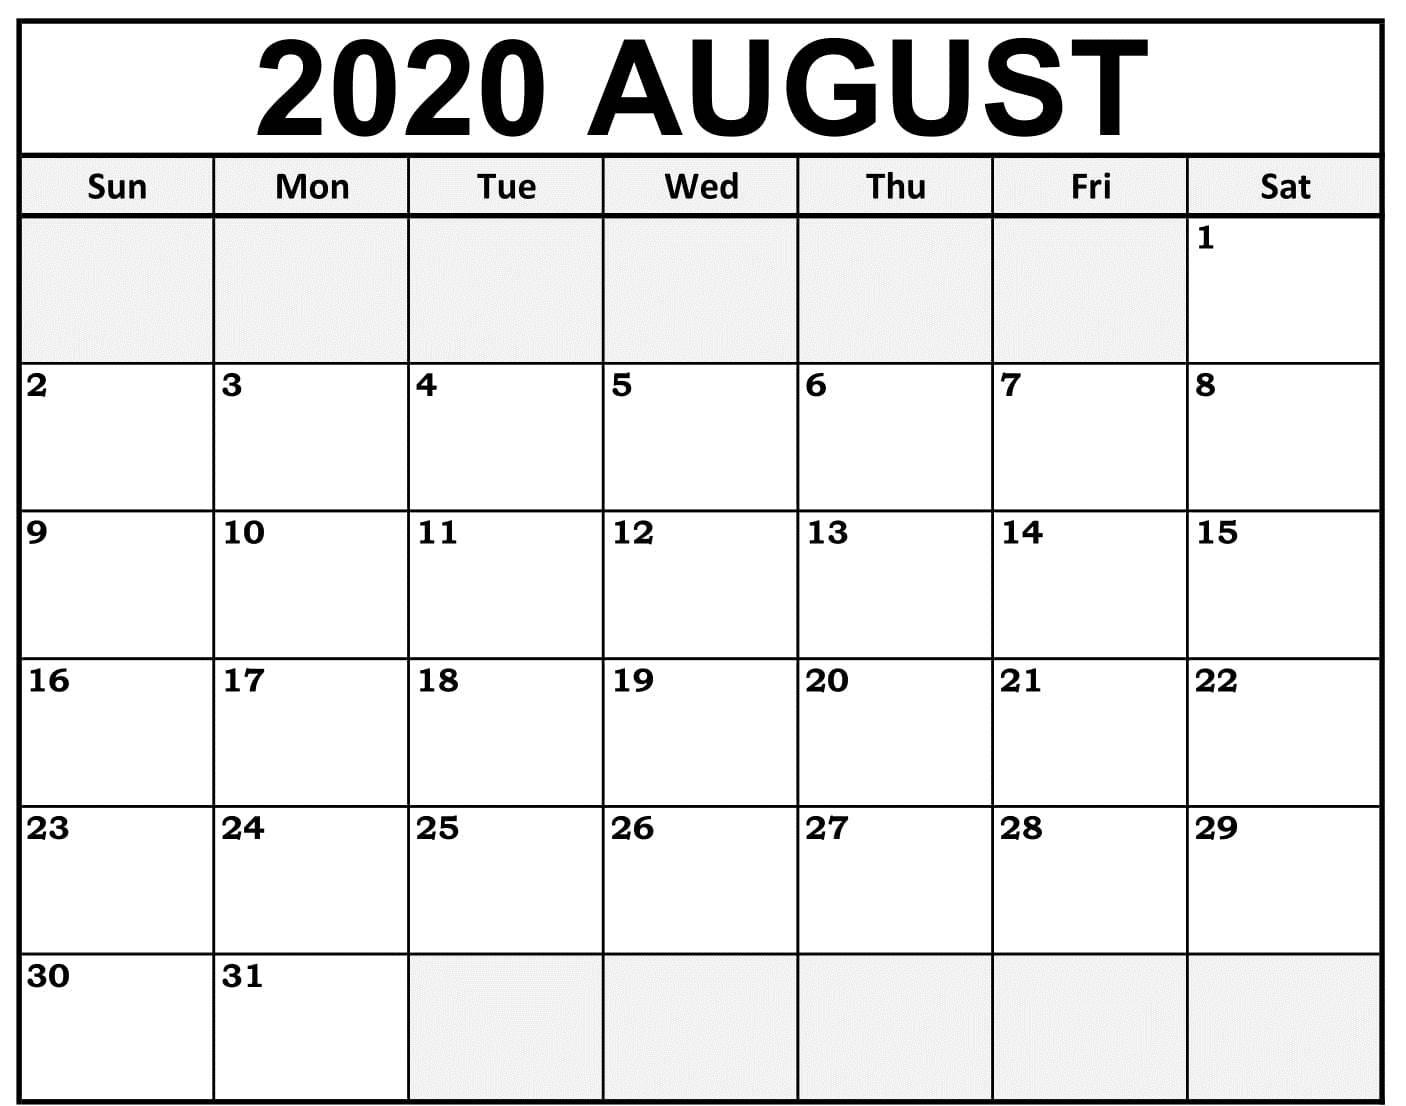 Free August 2020 Calendar Blank